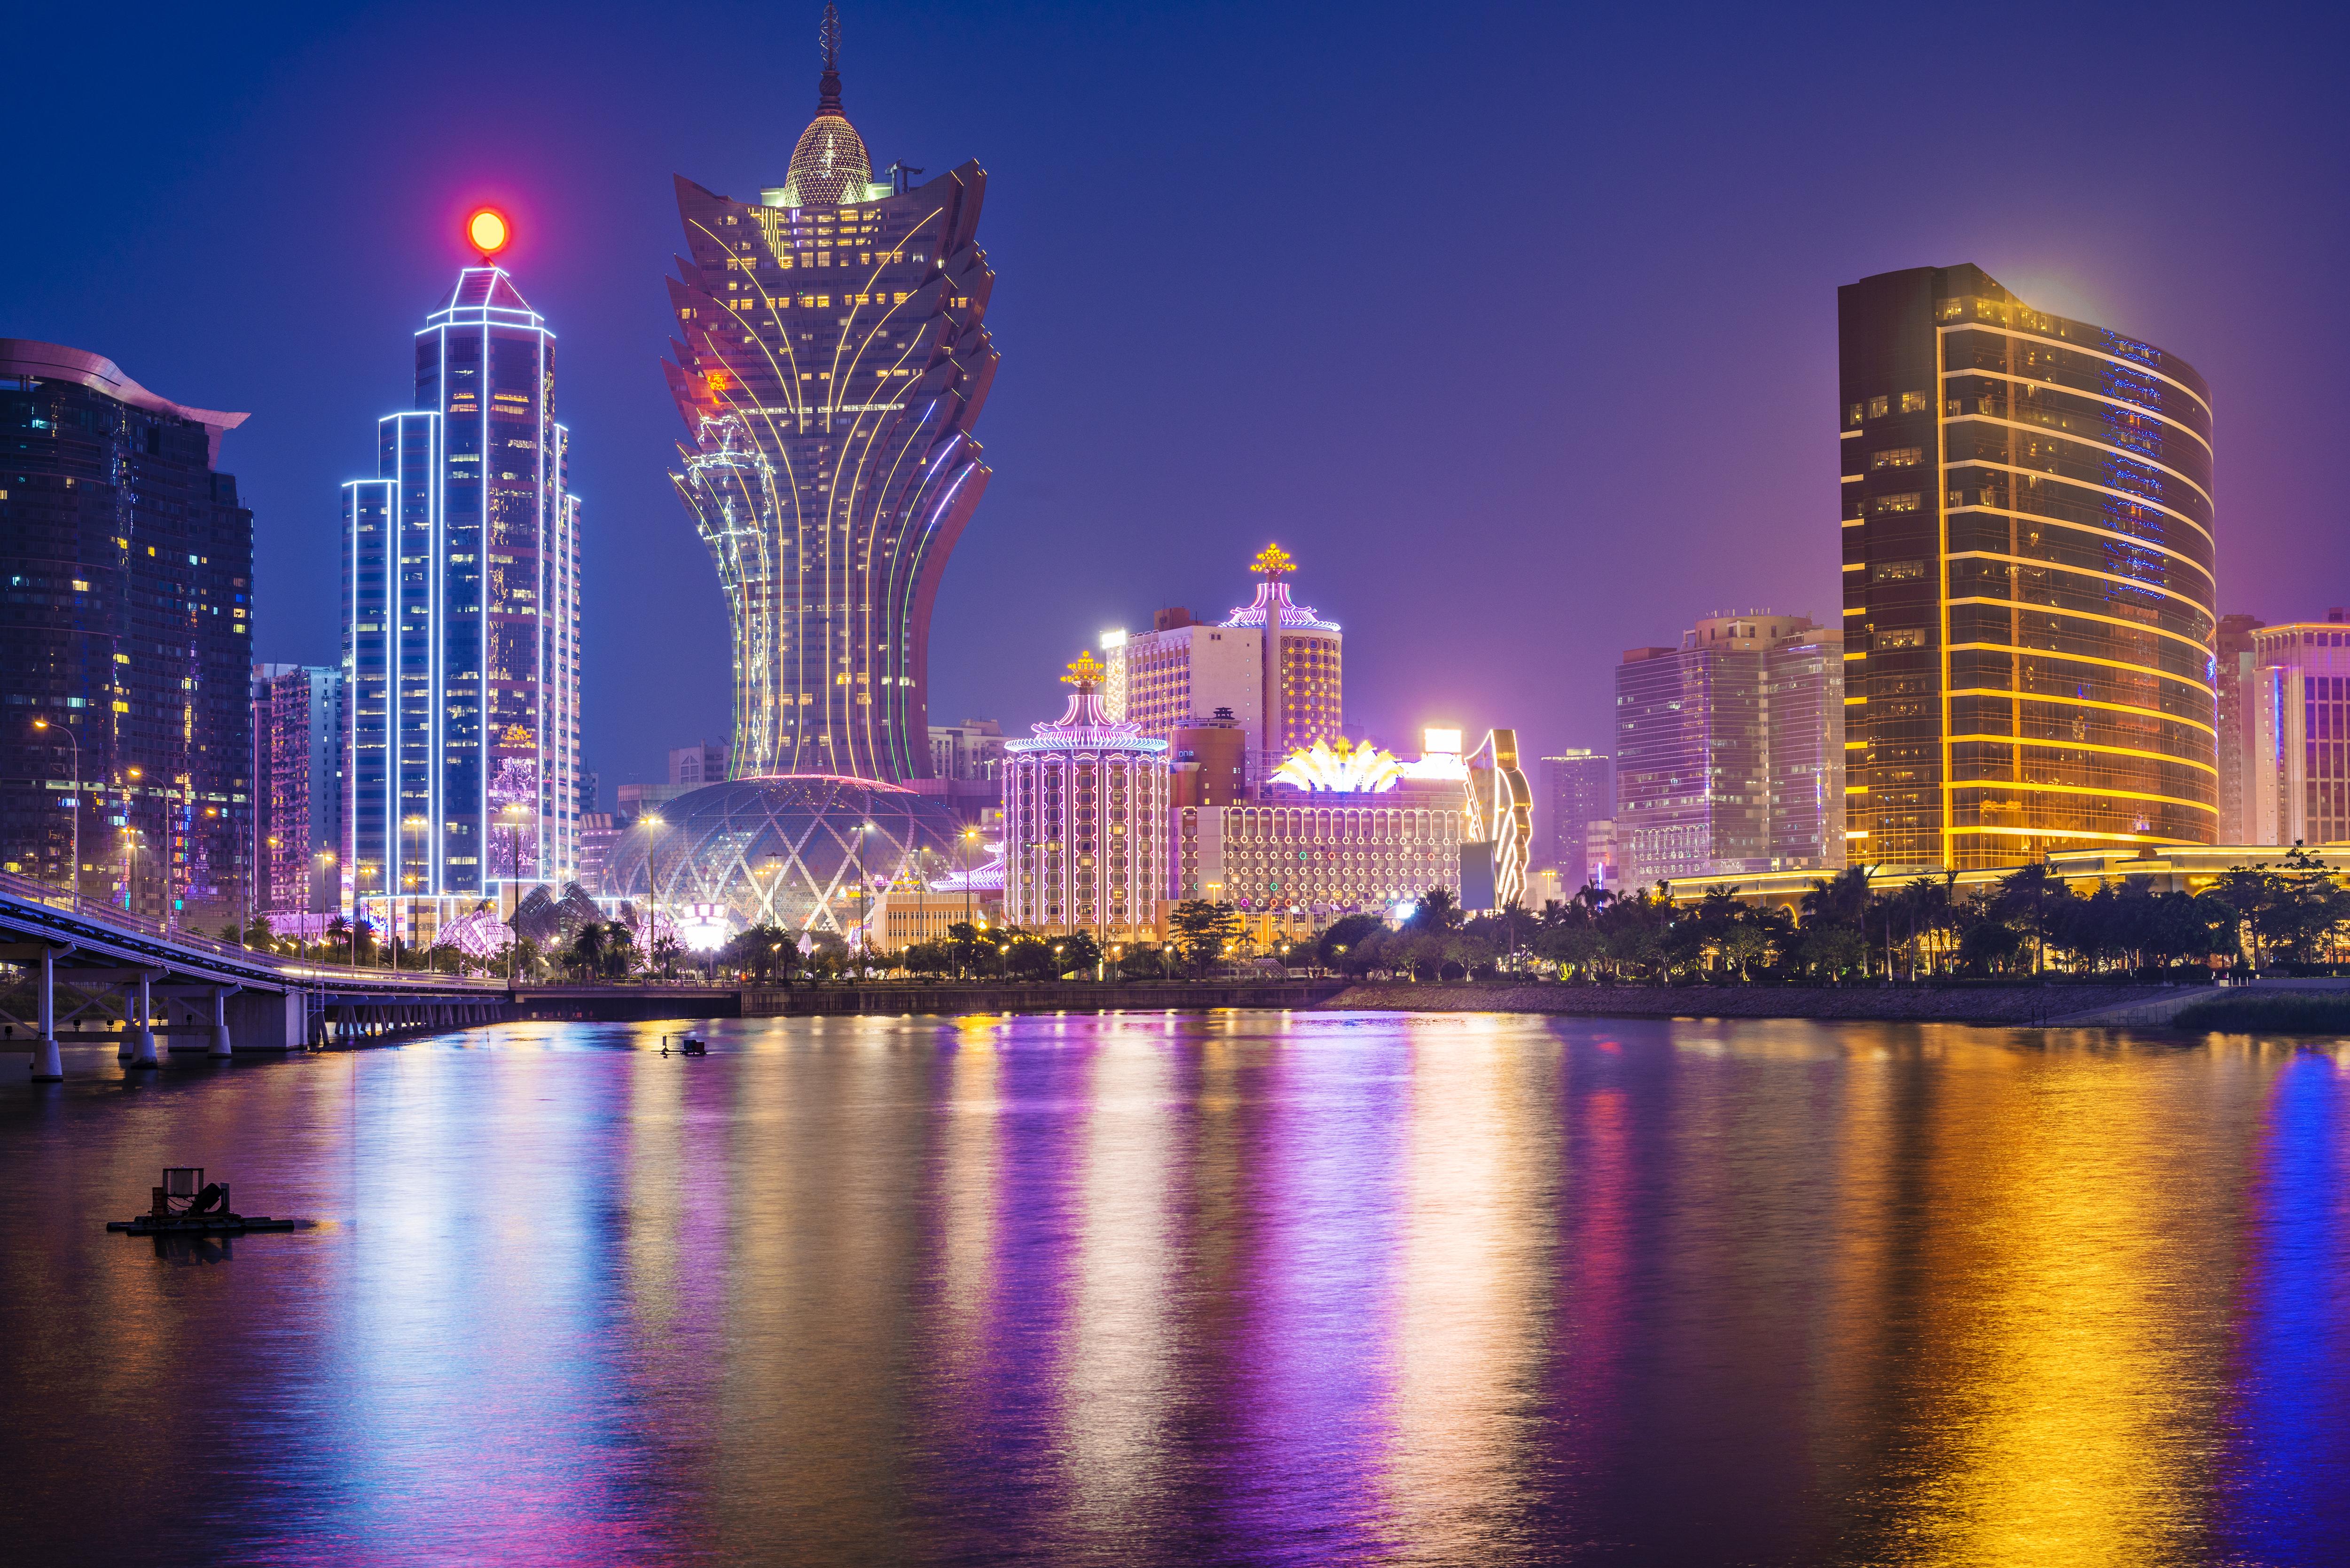 A river reflecting Macau's skyline lit up at night